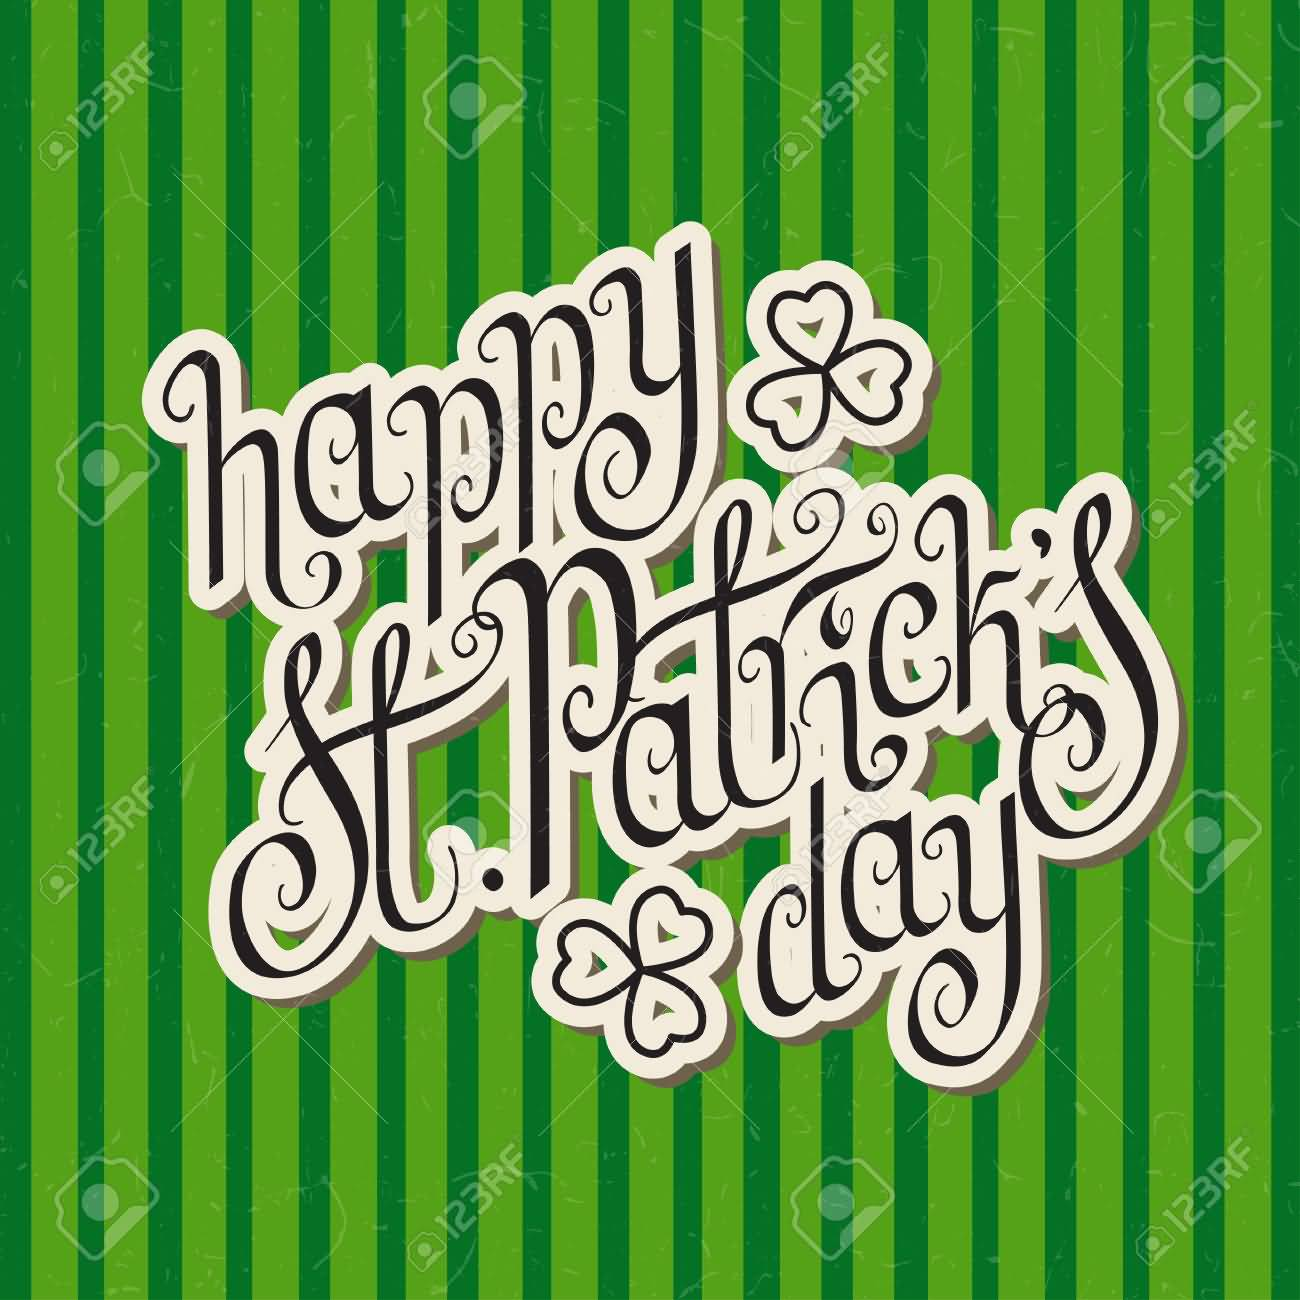 Happy Saint Patrick's Day 2017 Ecard